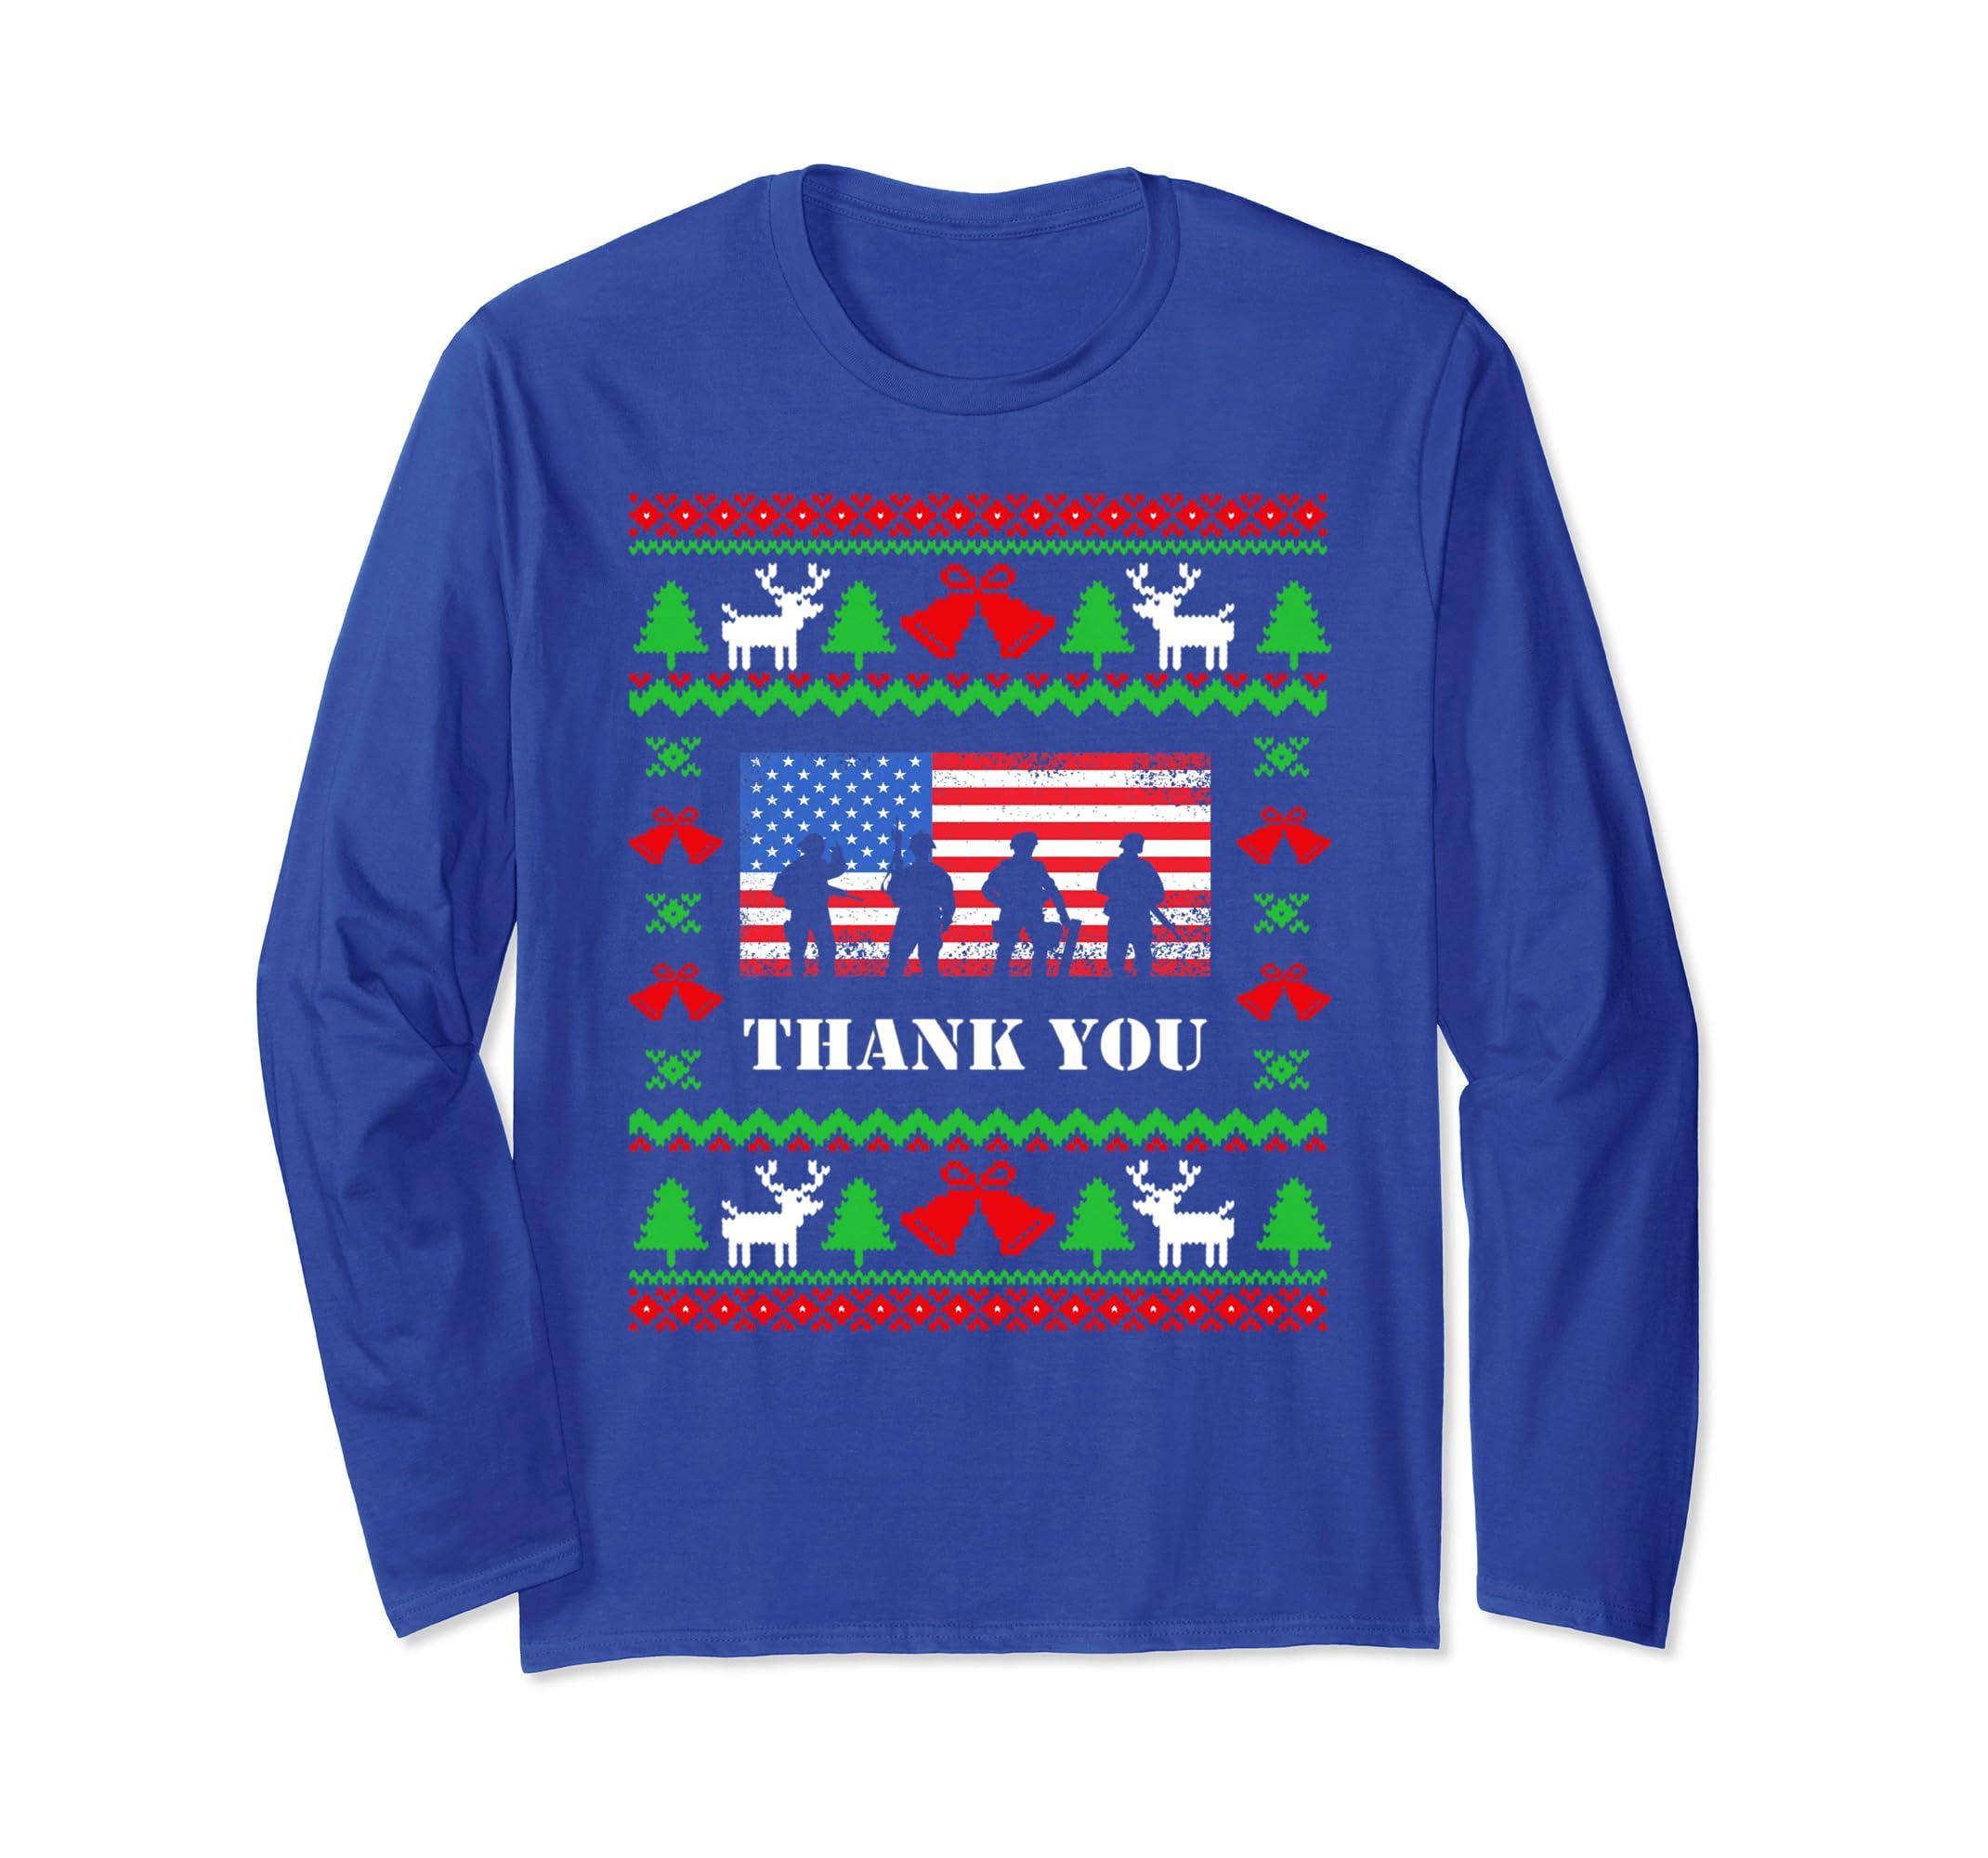 American Flag TShirts Thank you Veterans   Christmas Gift-azvn